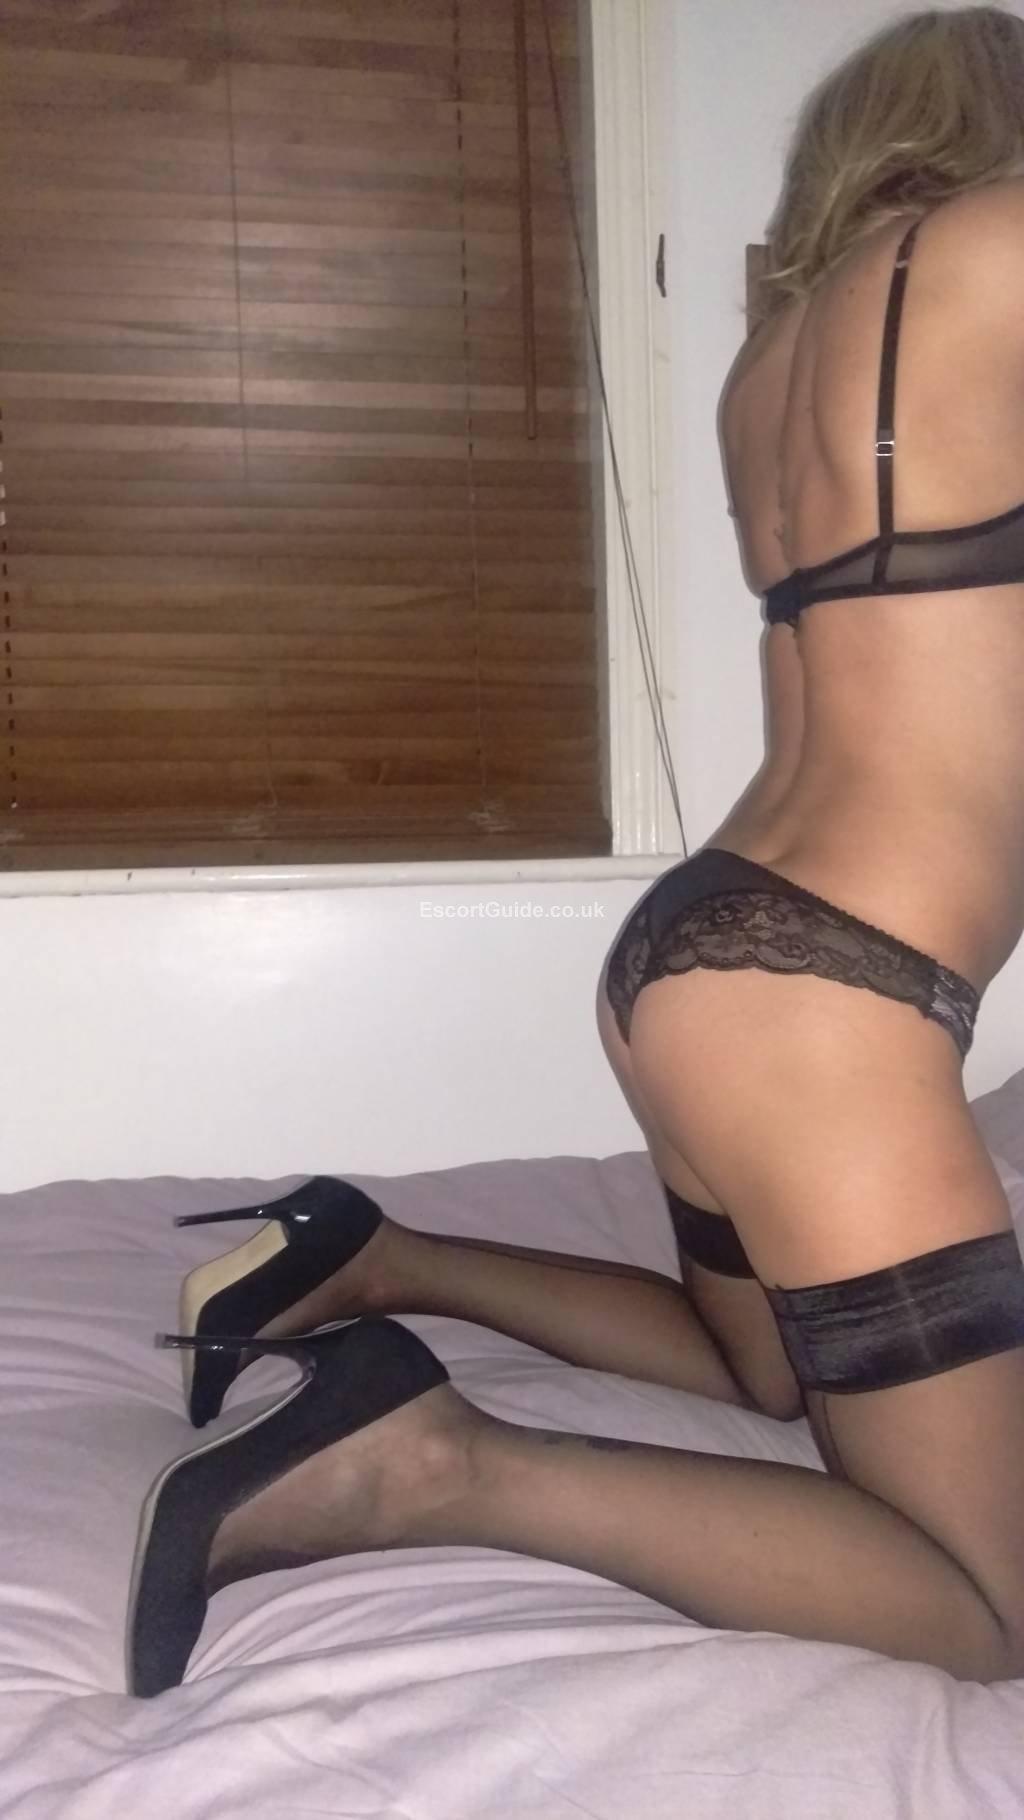 Escorts brighton uk Brighton Escorts, Female independent escorts in Brighton - Skokka